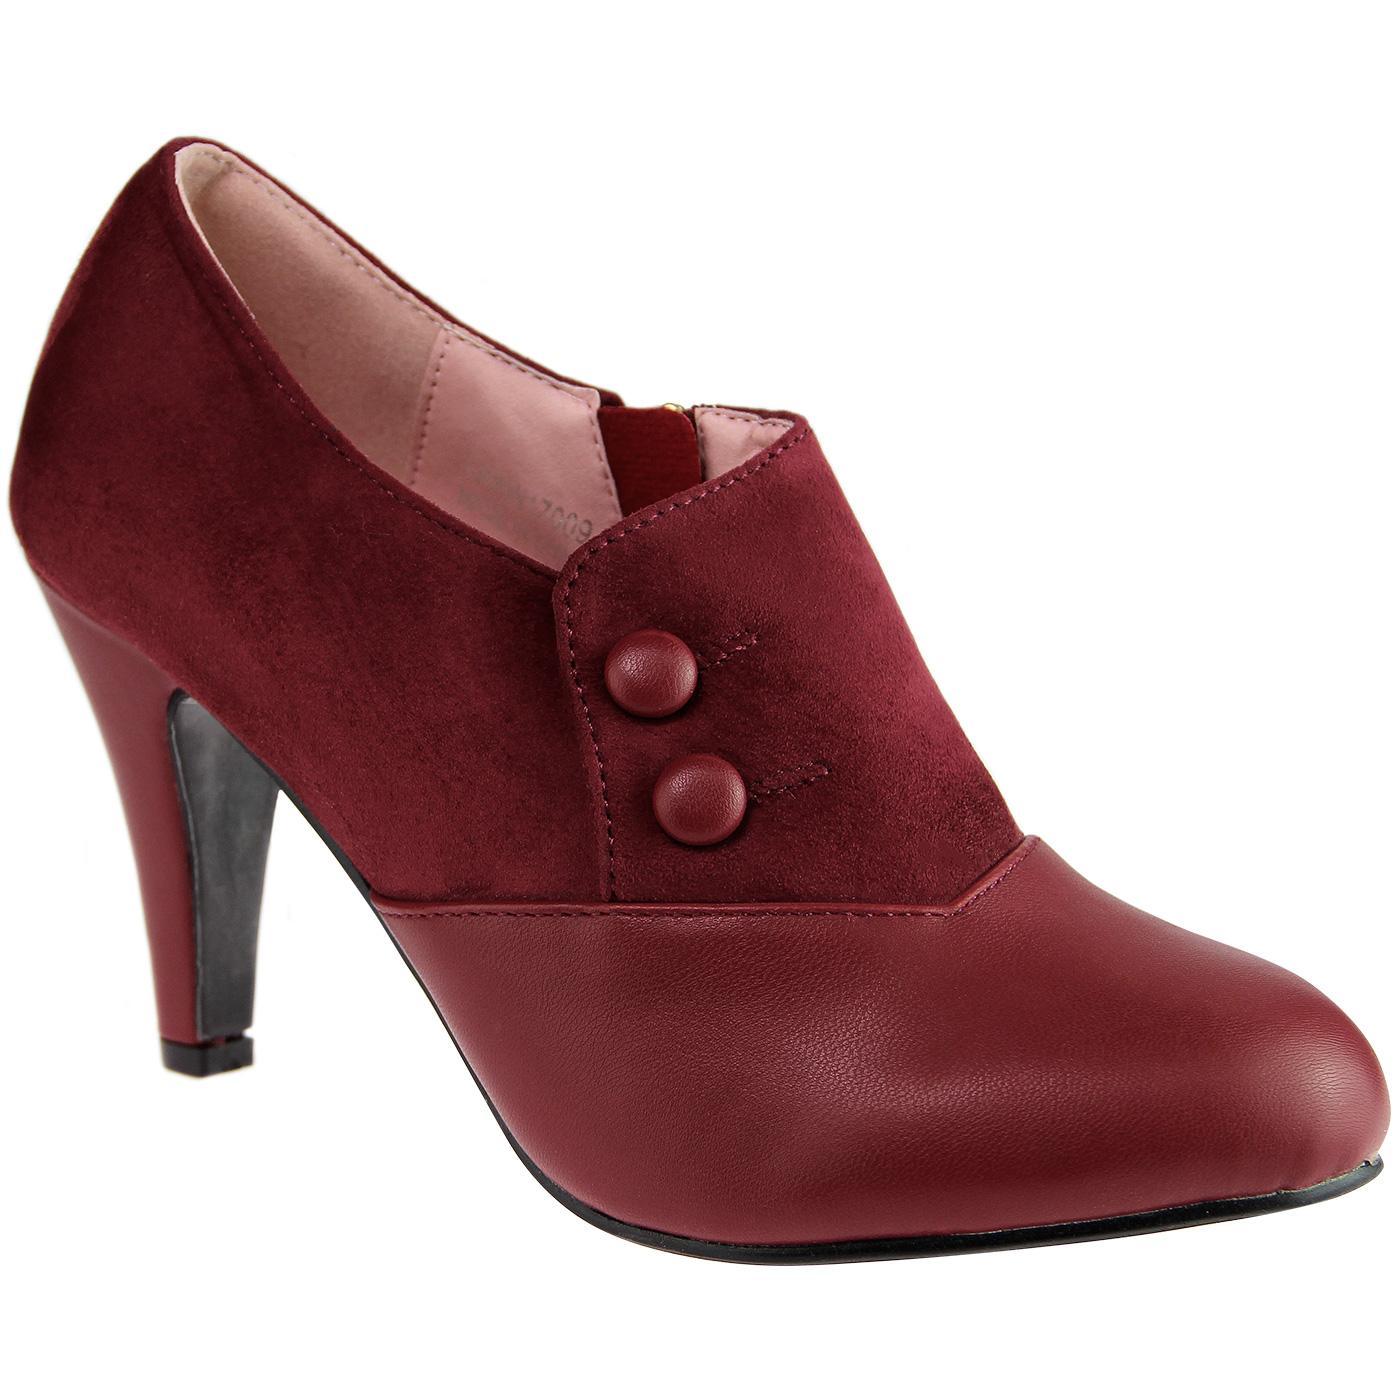 Maria LULU HUN Vintage Retro Heel Boots Burgundy